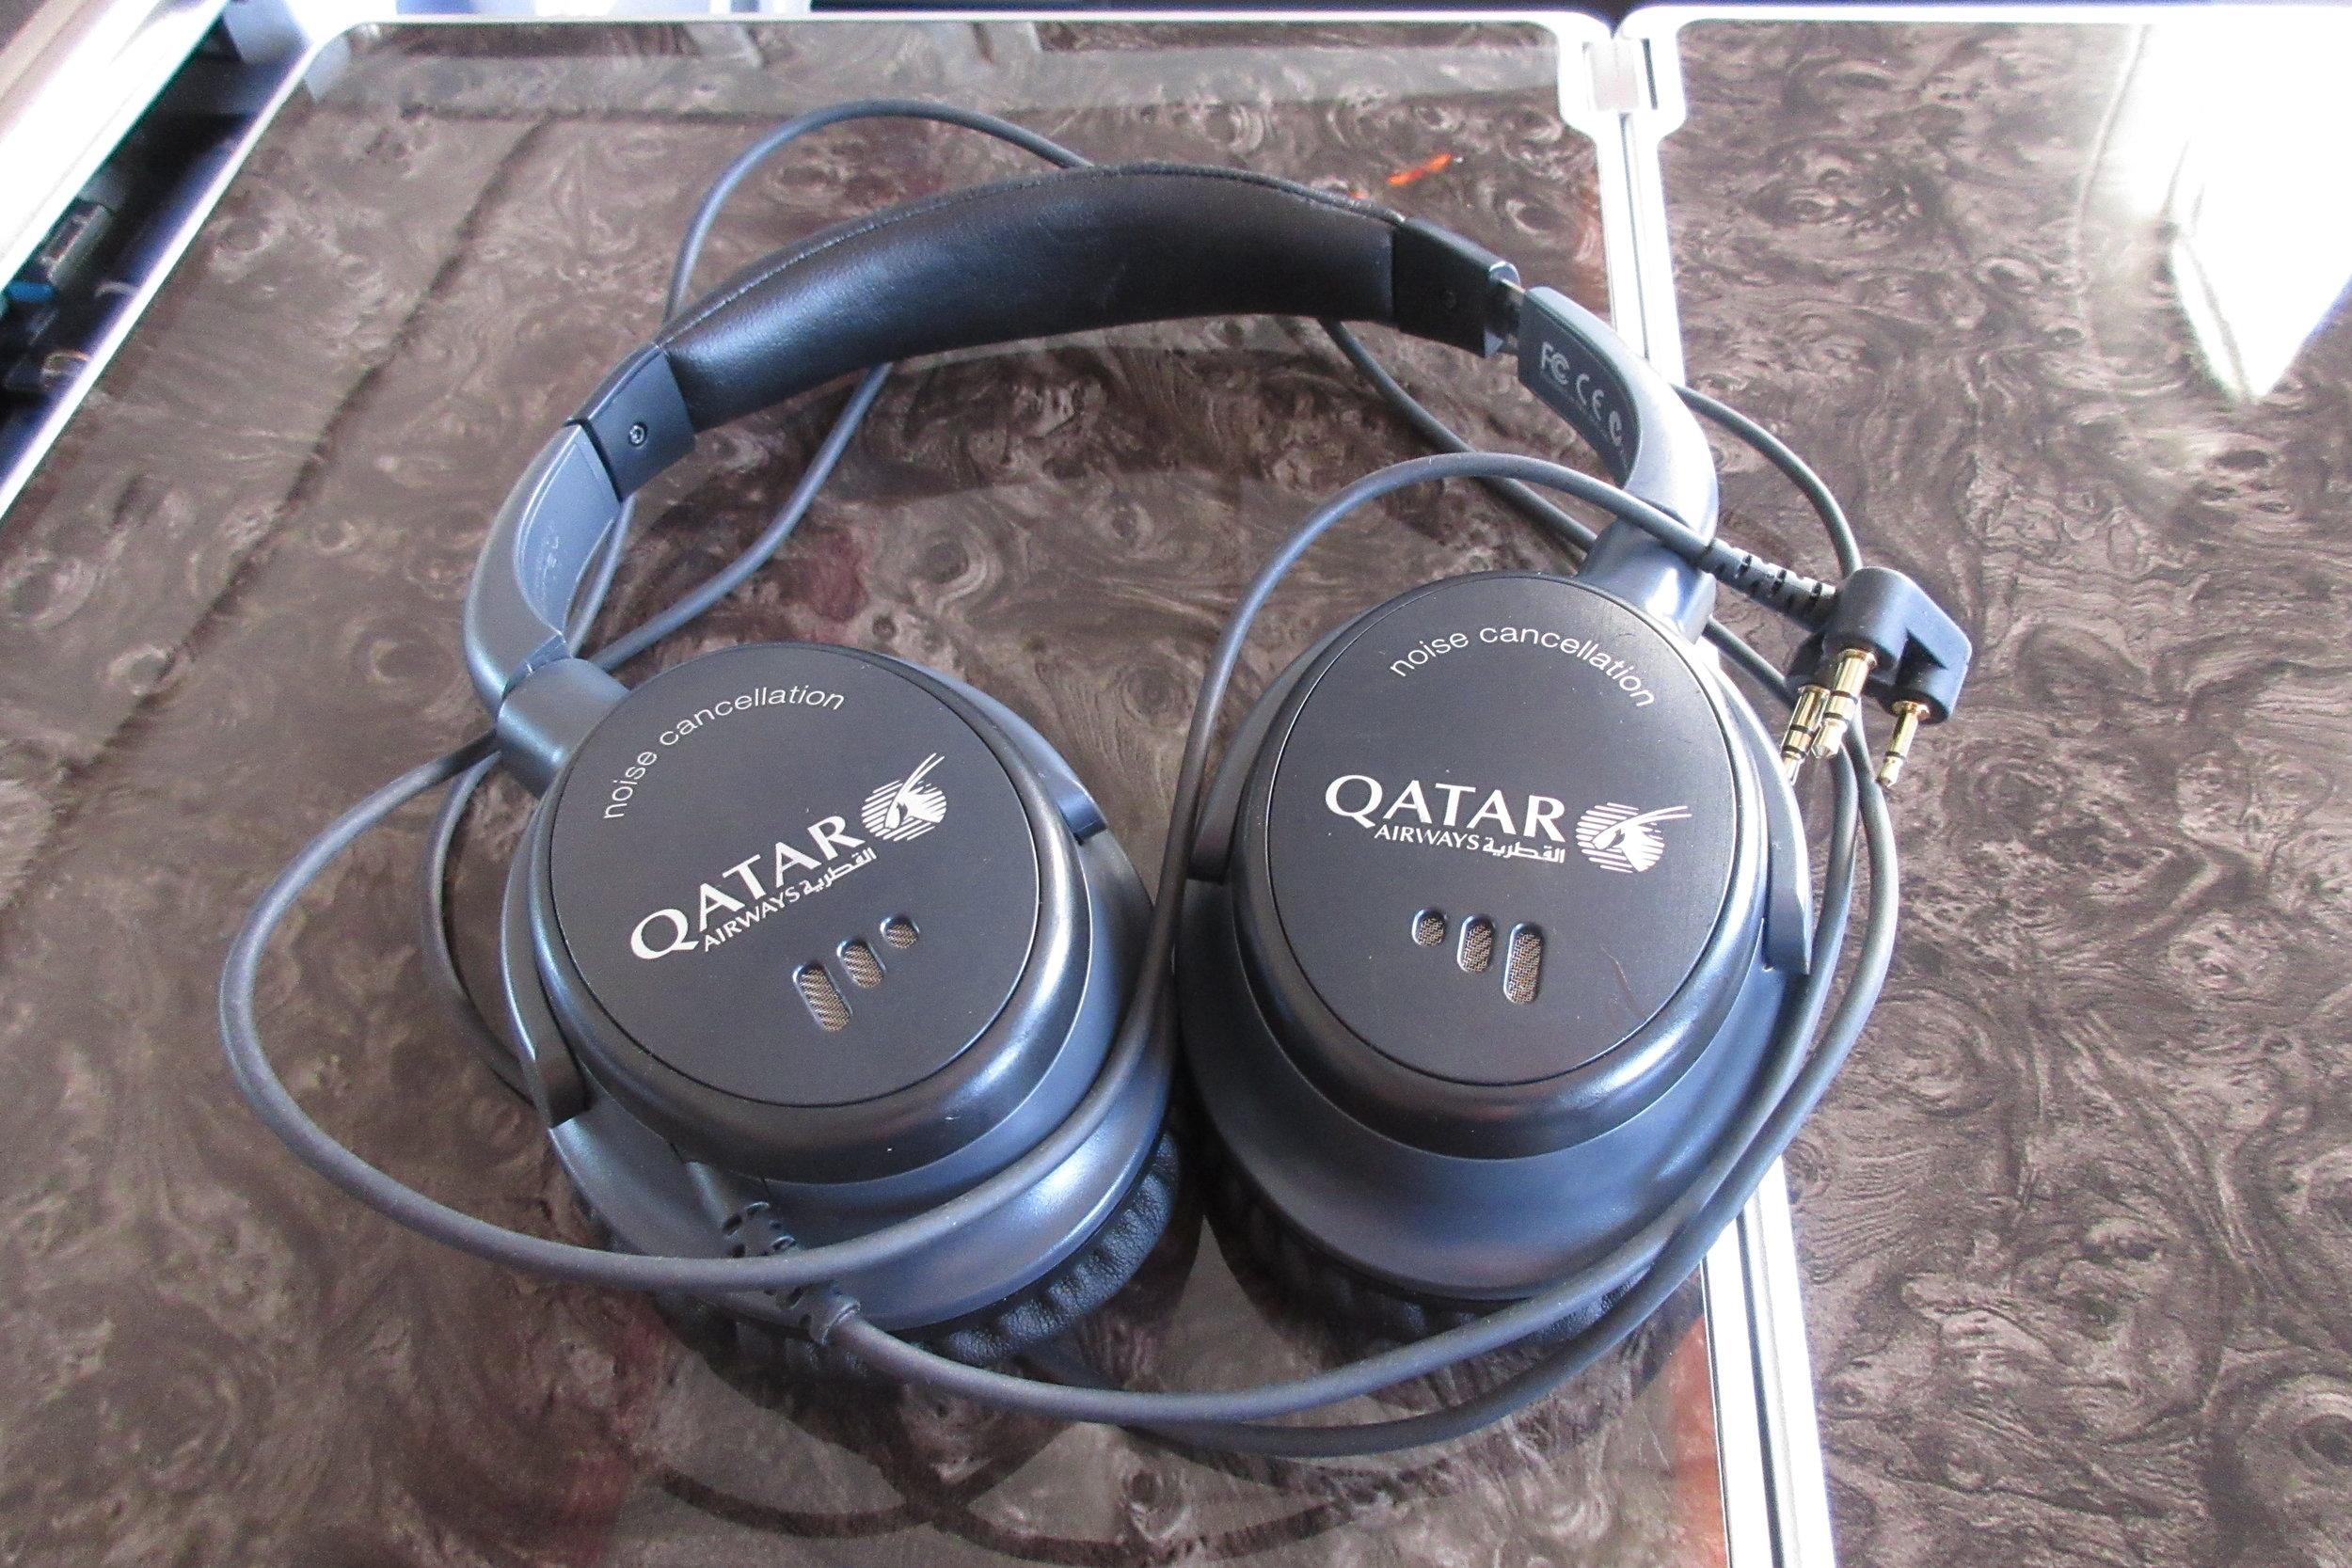 Qatar Airways 777 business class – Headphones